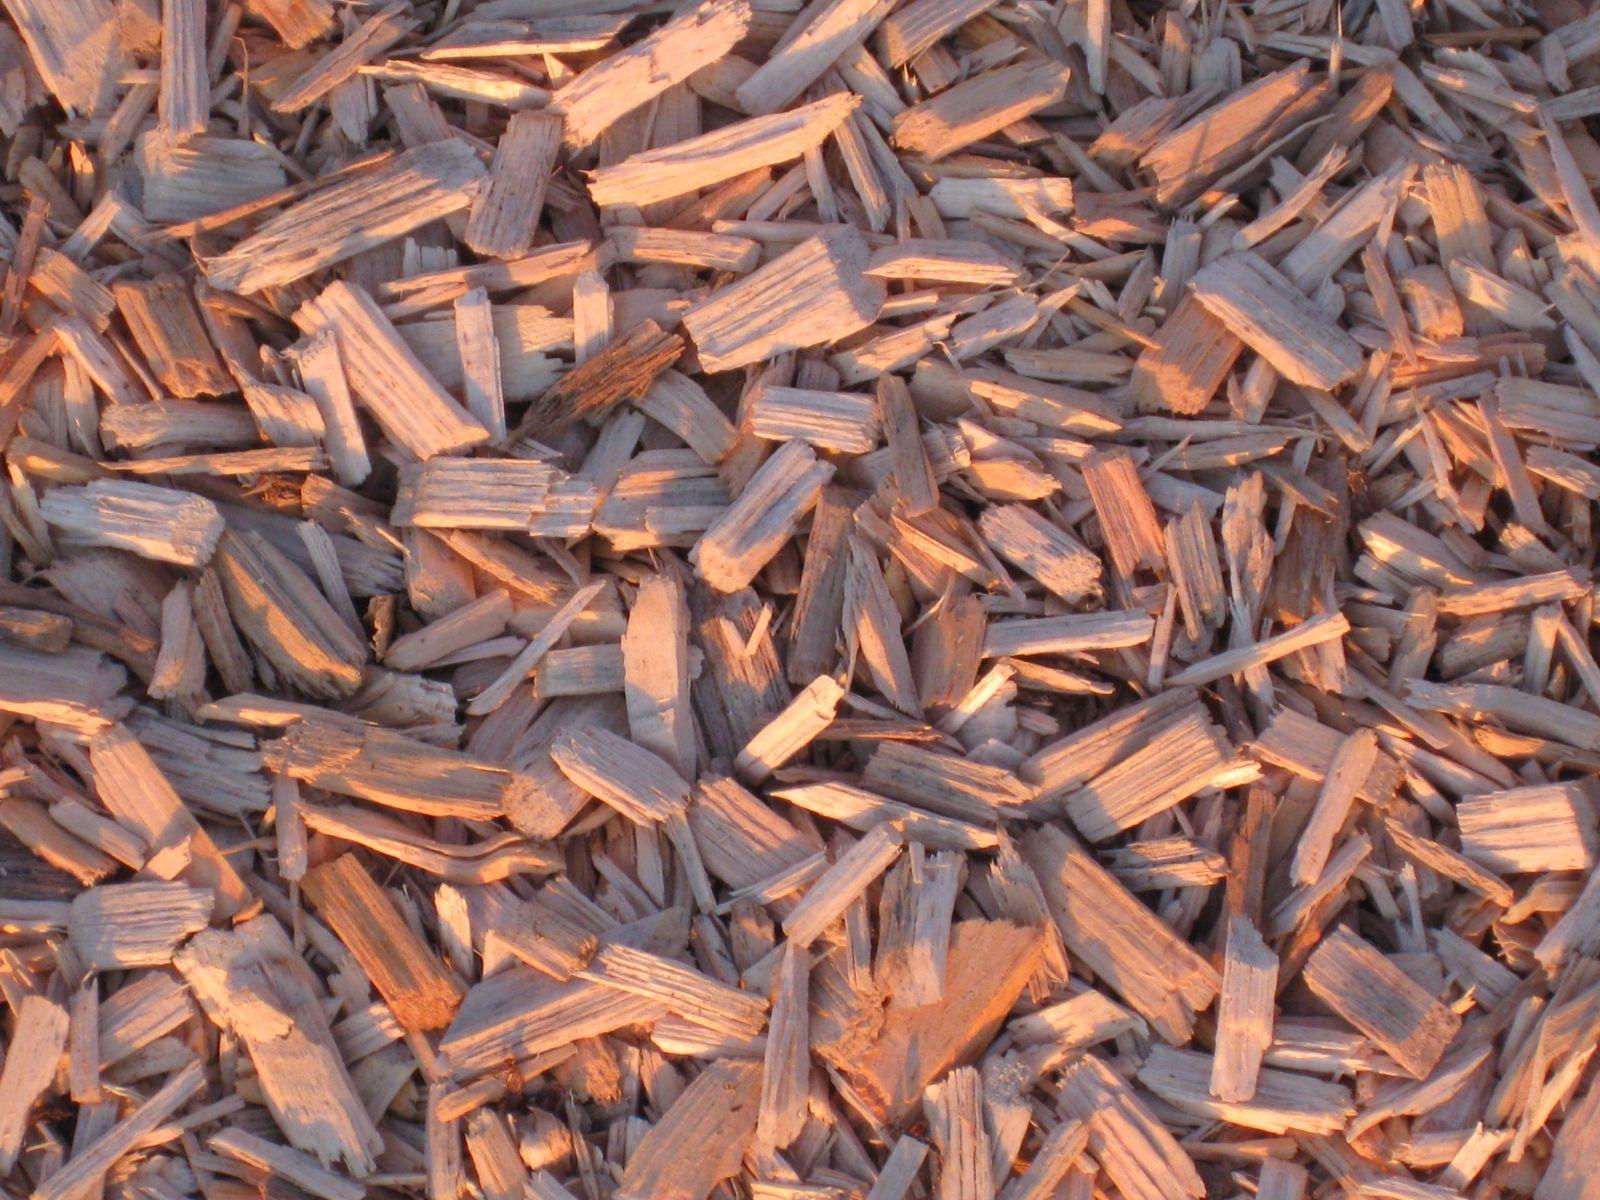 Mmc Bark Llc Mulch Products Natural Wood